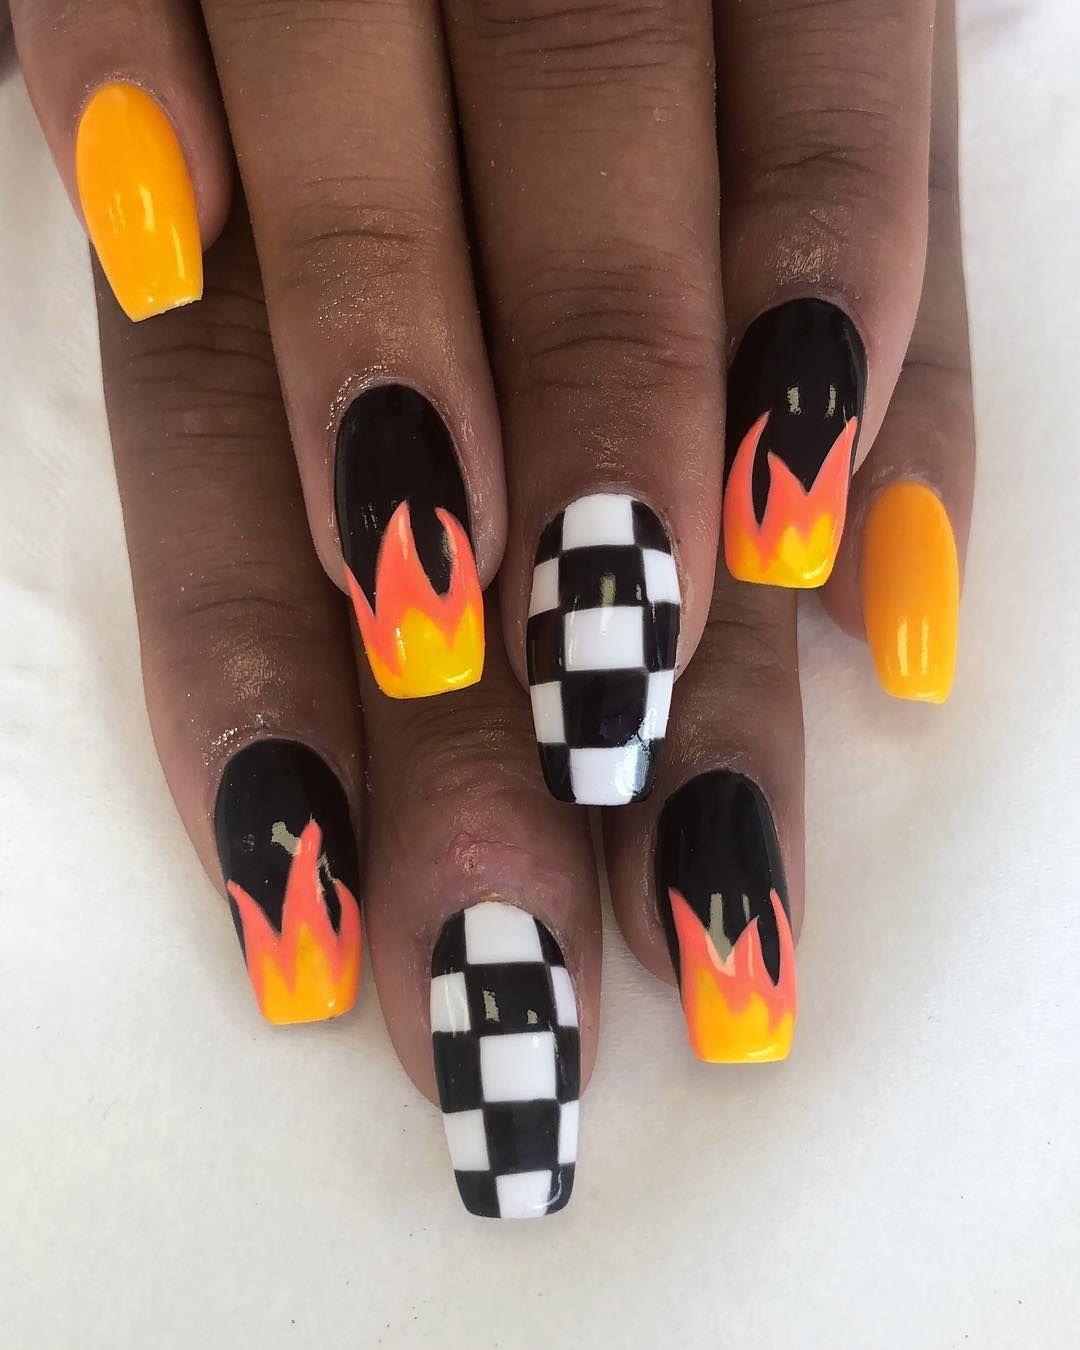 Full Set Of Acrylics With Nail Art Link In Bio To Book Nails Nailart Nailsofinstagram Acrylic Acrylicnails Checkered Nails Flame Nail Art Fire Nails